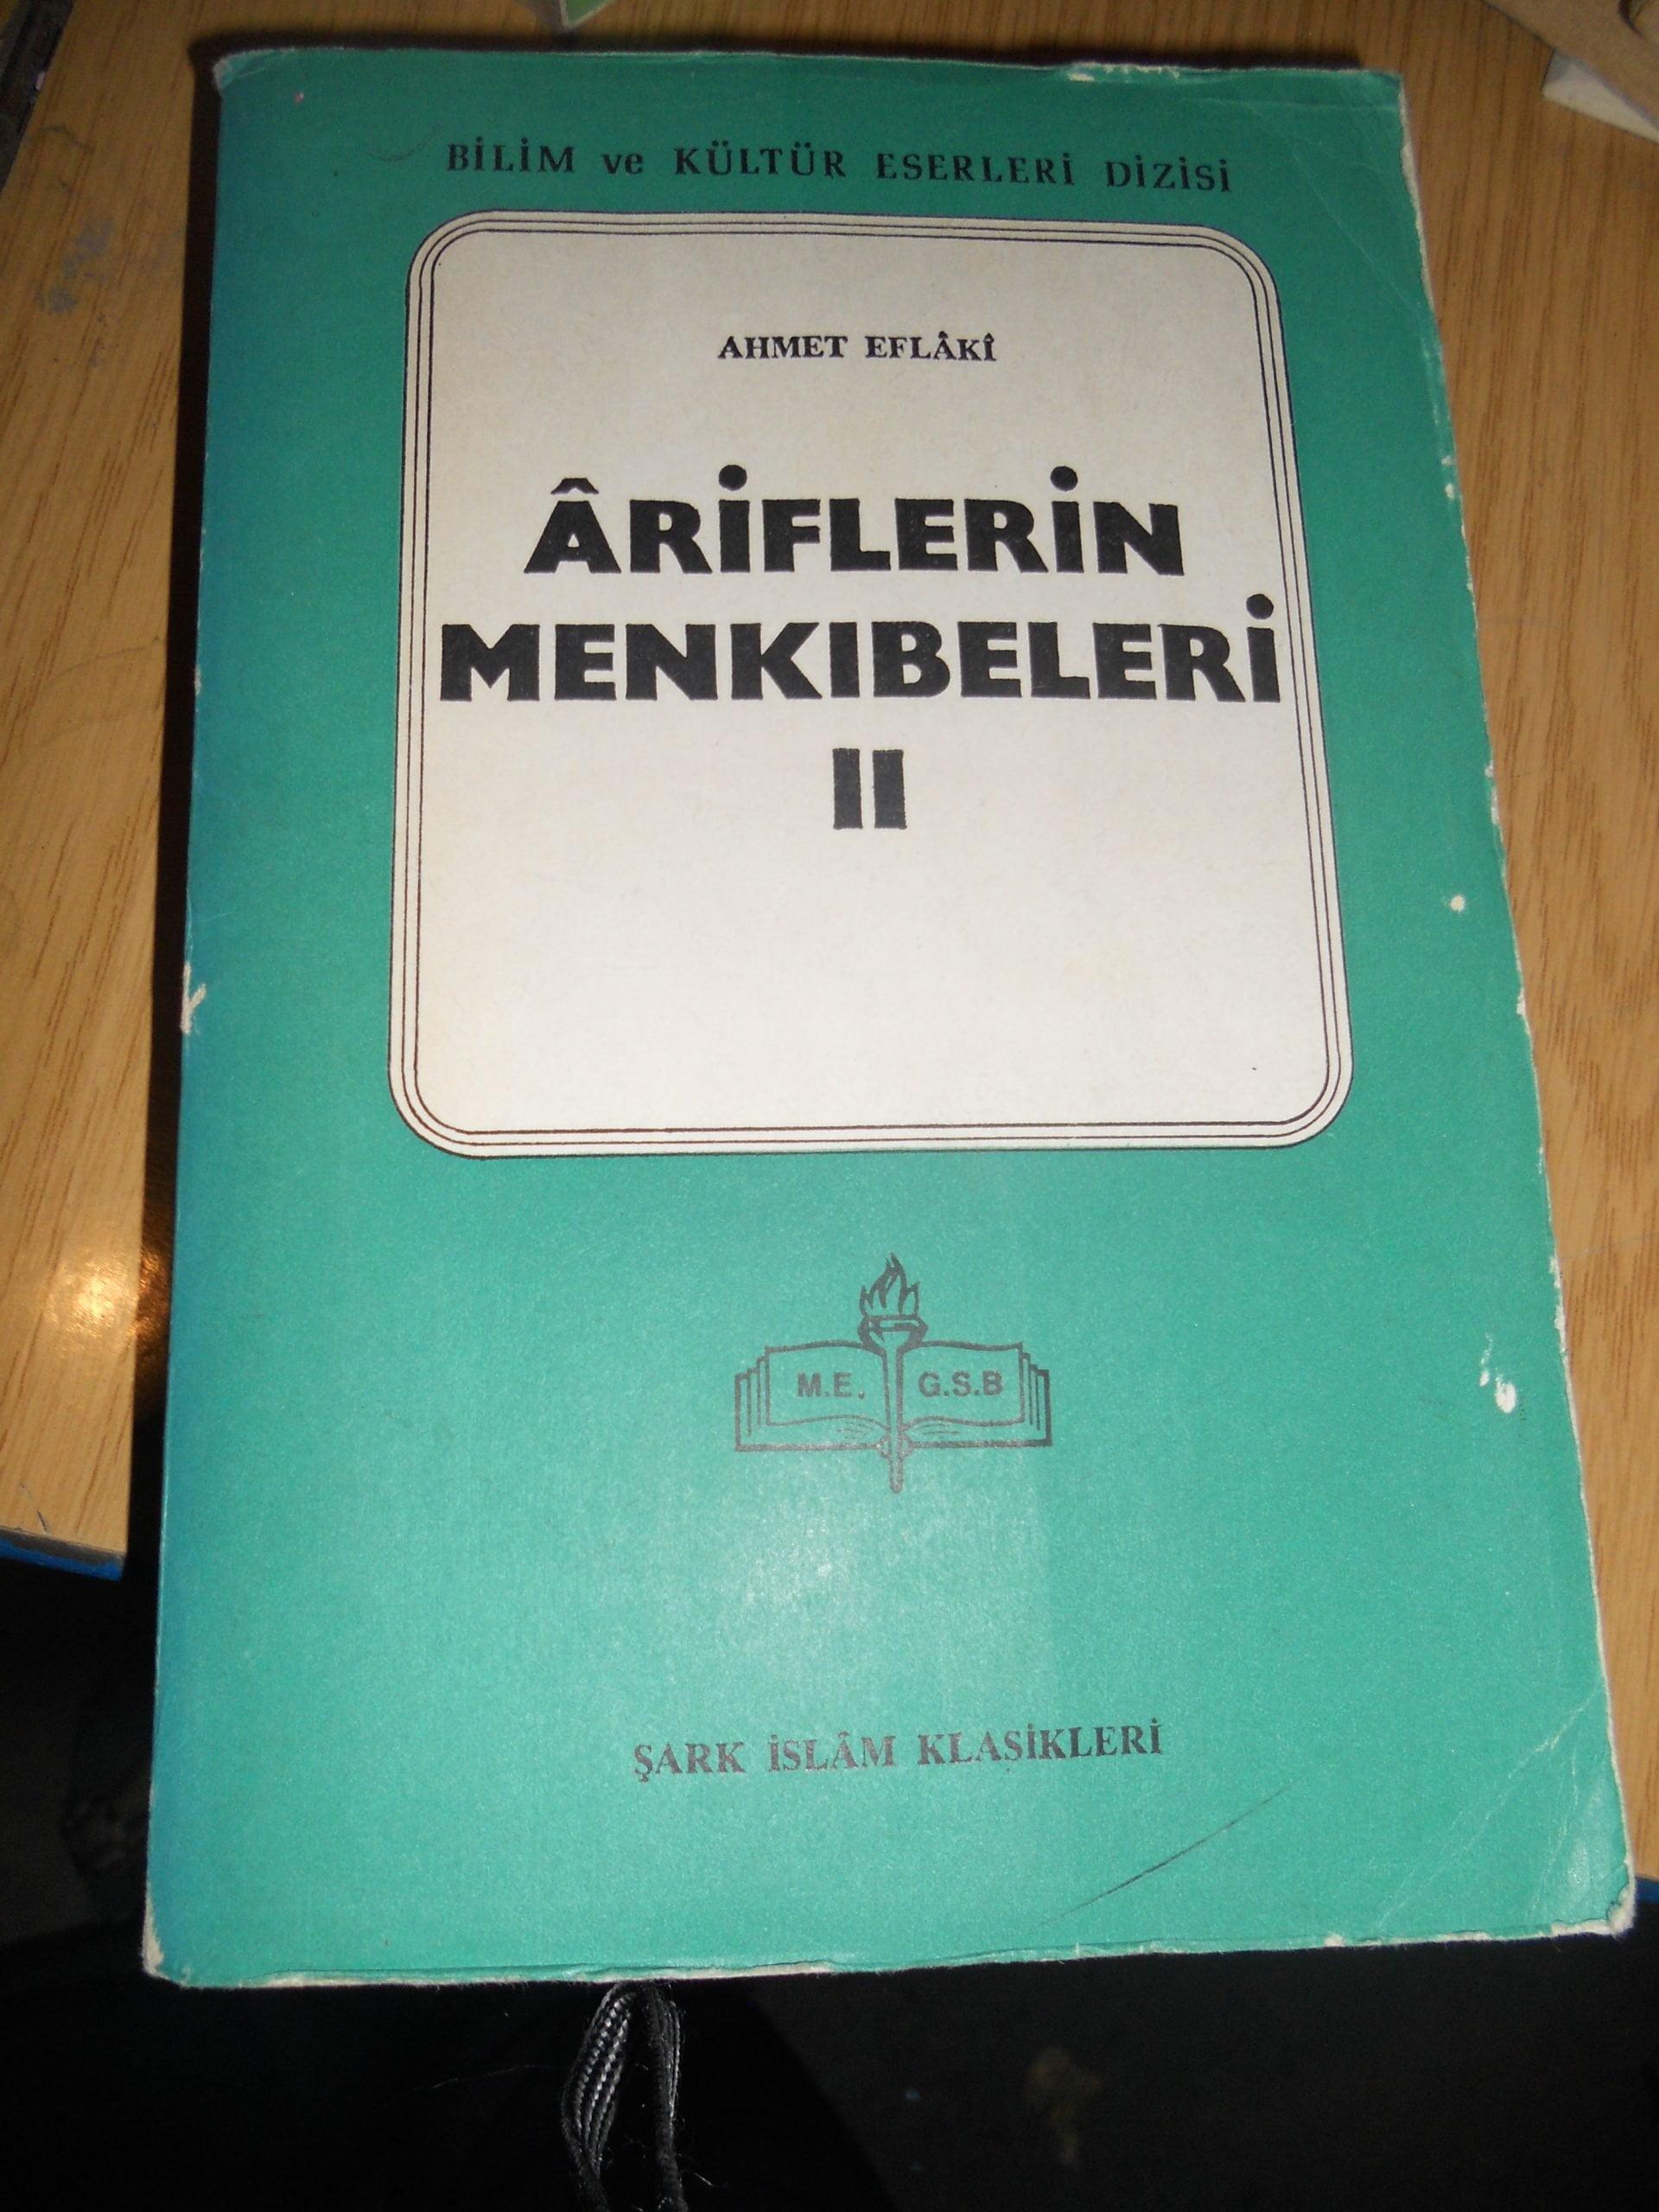 ARİFLERİN MENKIBELERİ II/Ahmet EFLAKİ/15 TL